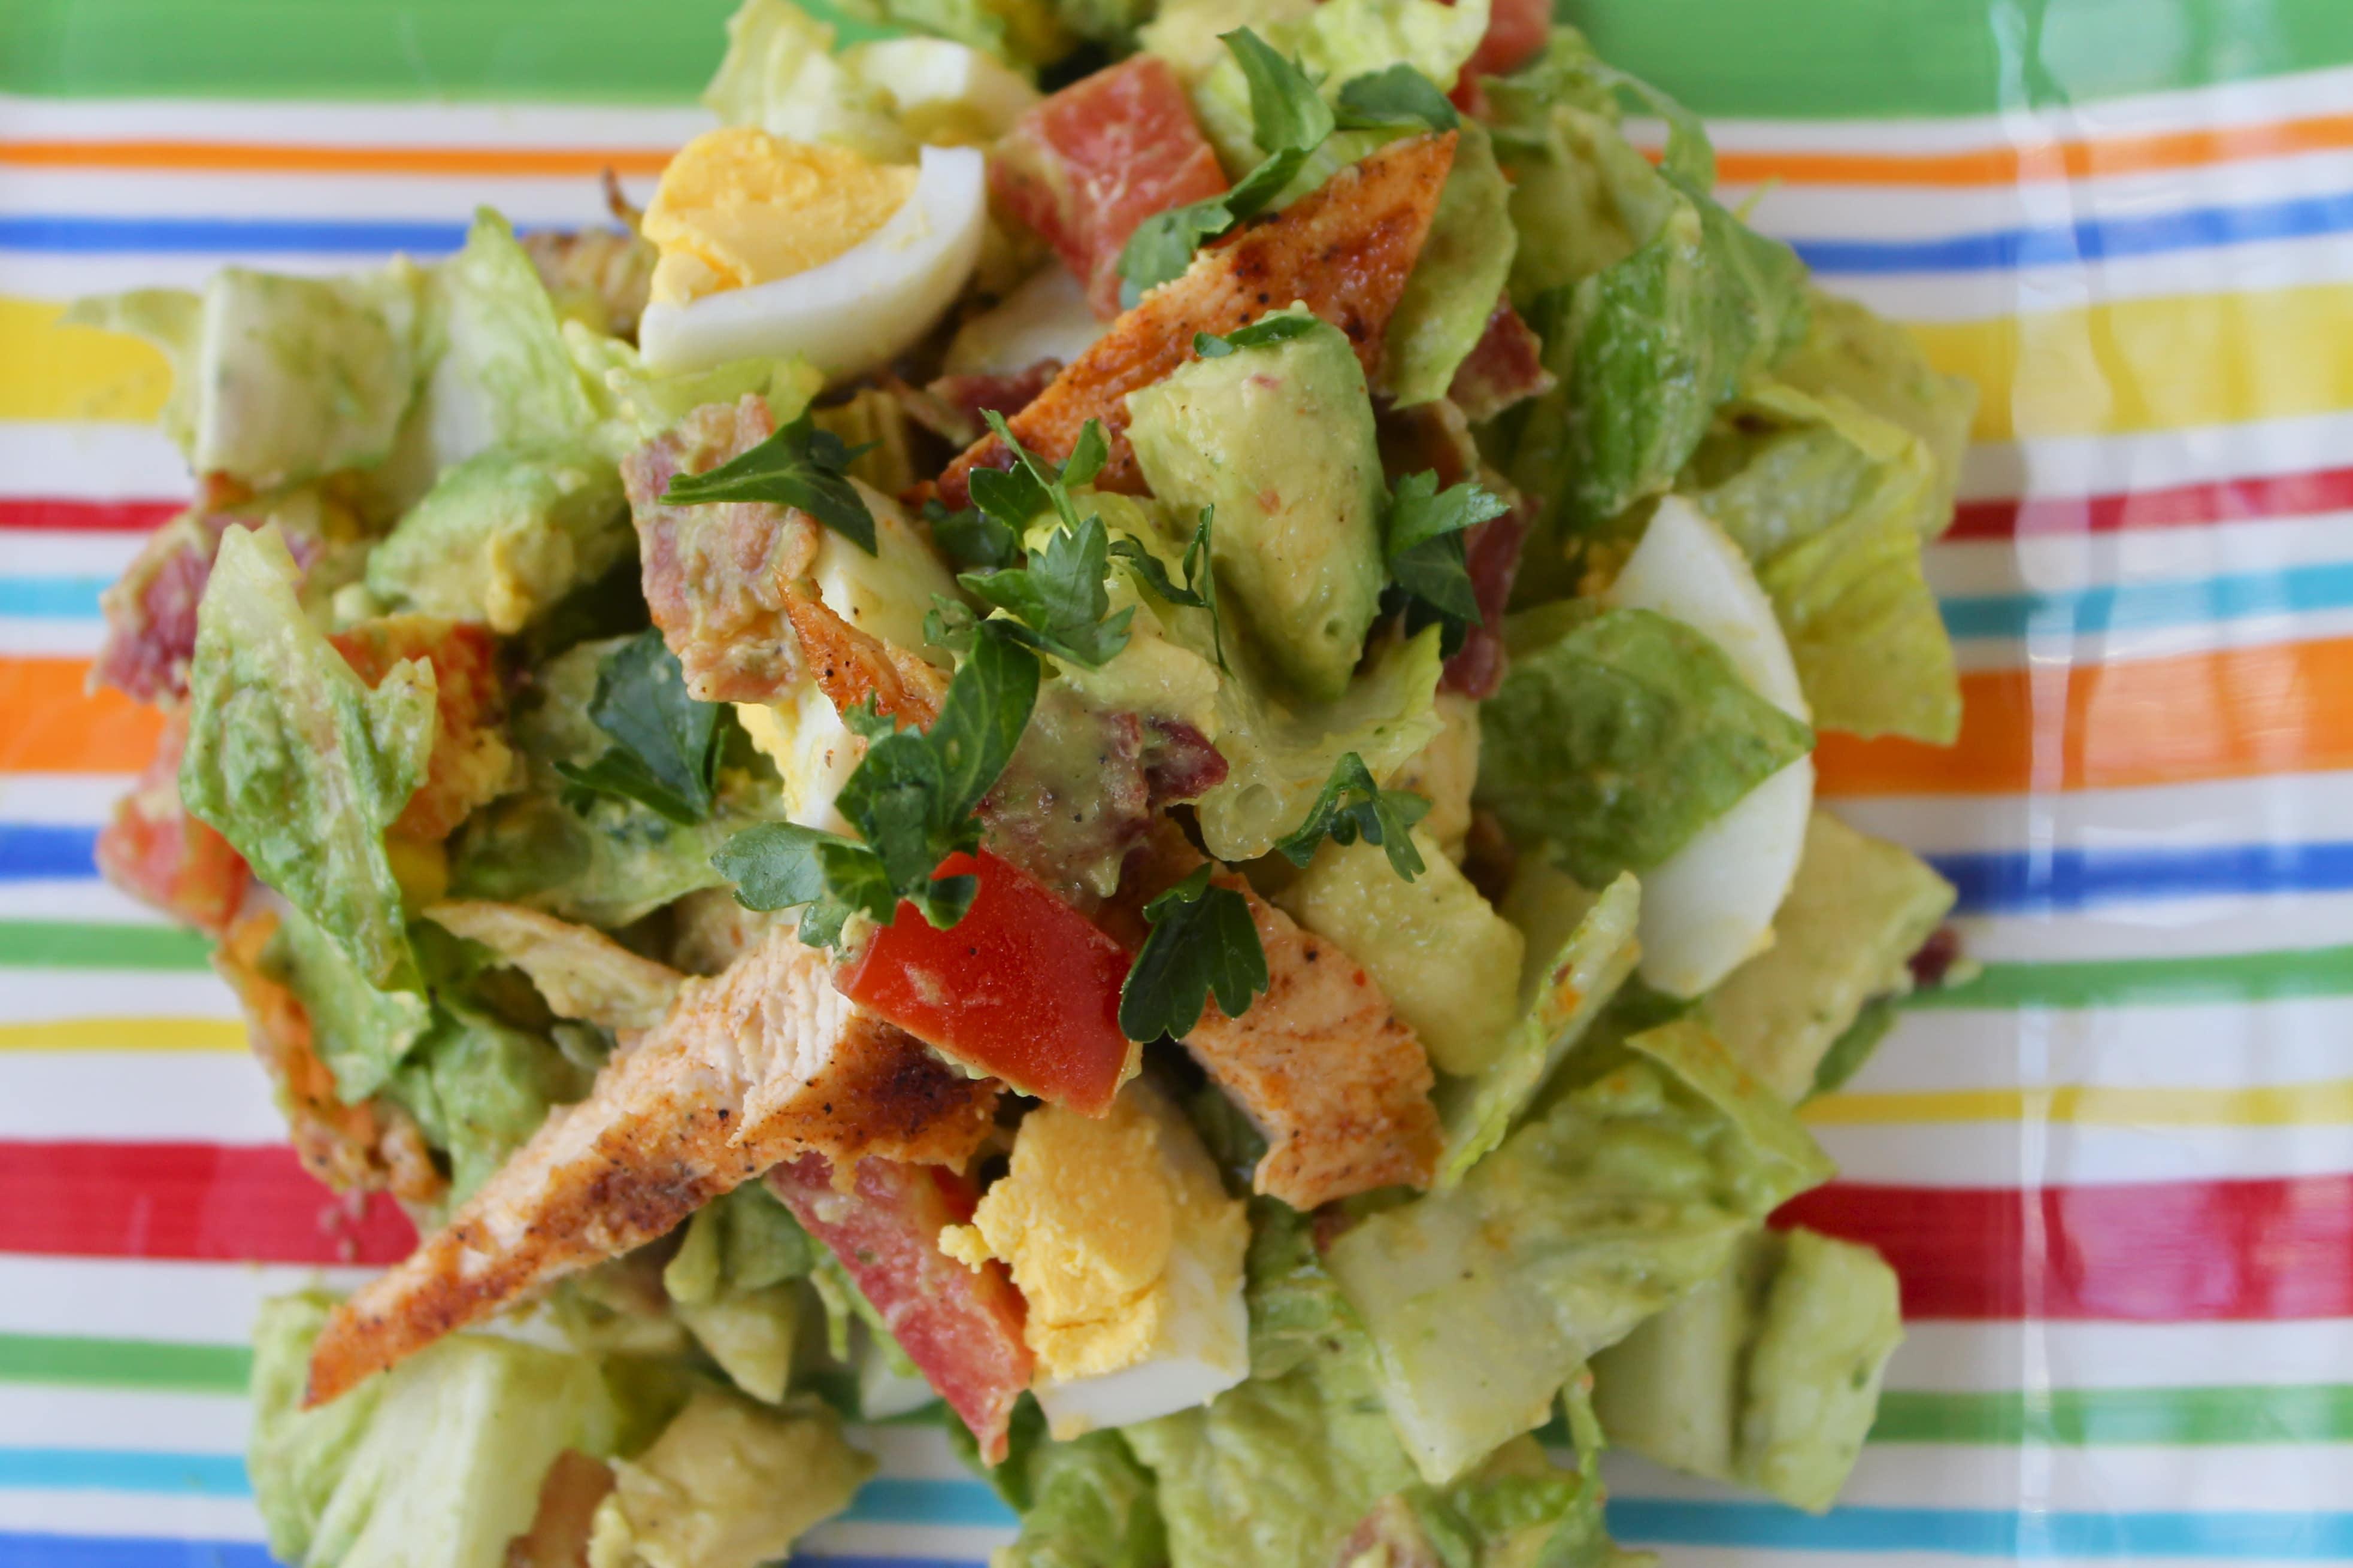 Lemony Smoked Paprika Chicken Chopped Salad with Creamy Avocado Dressing